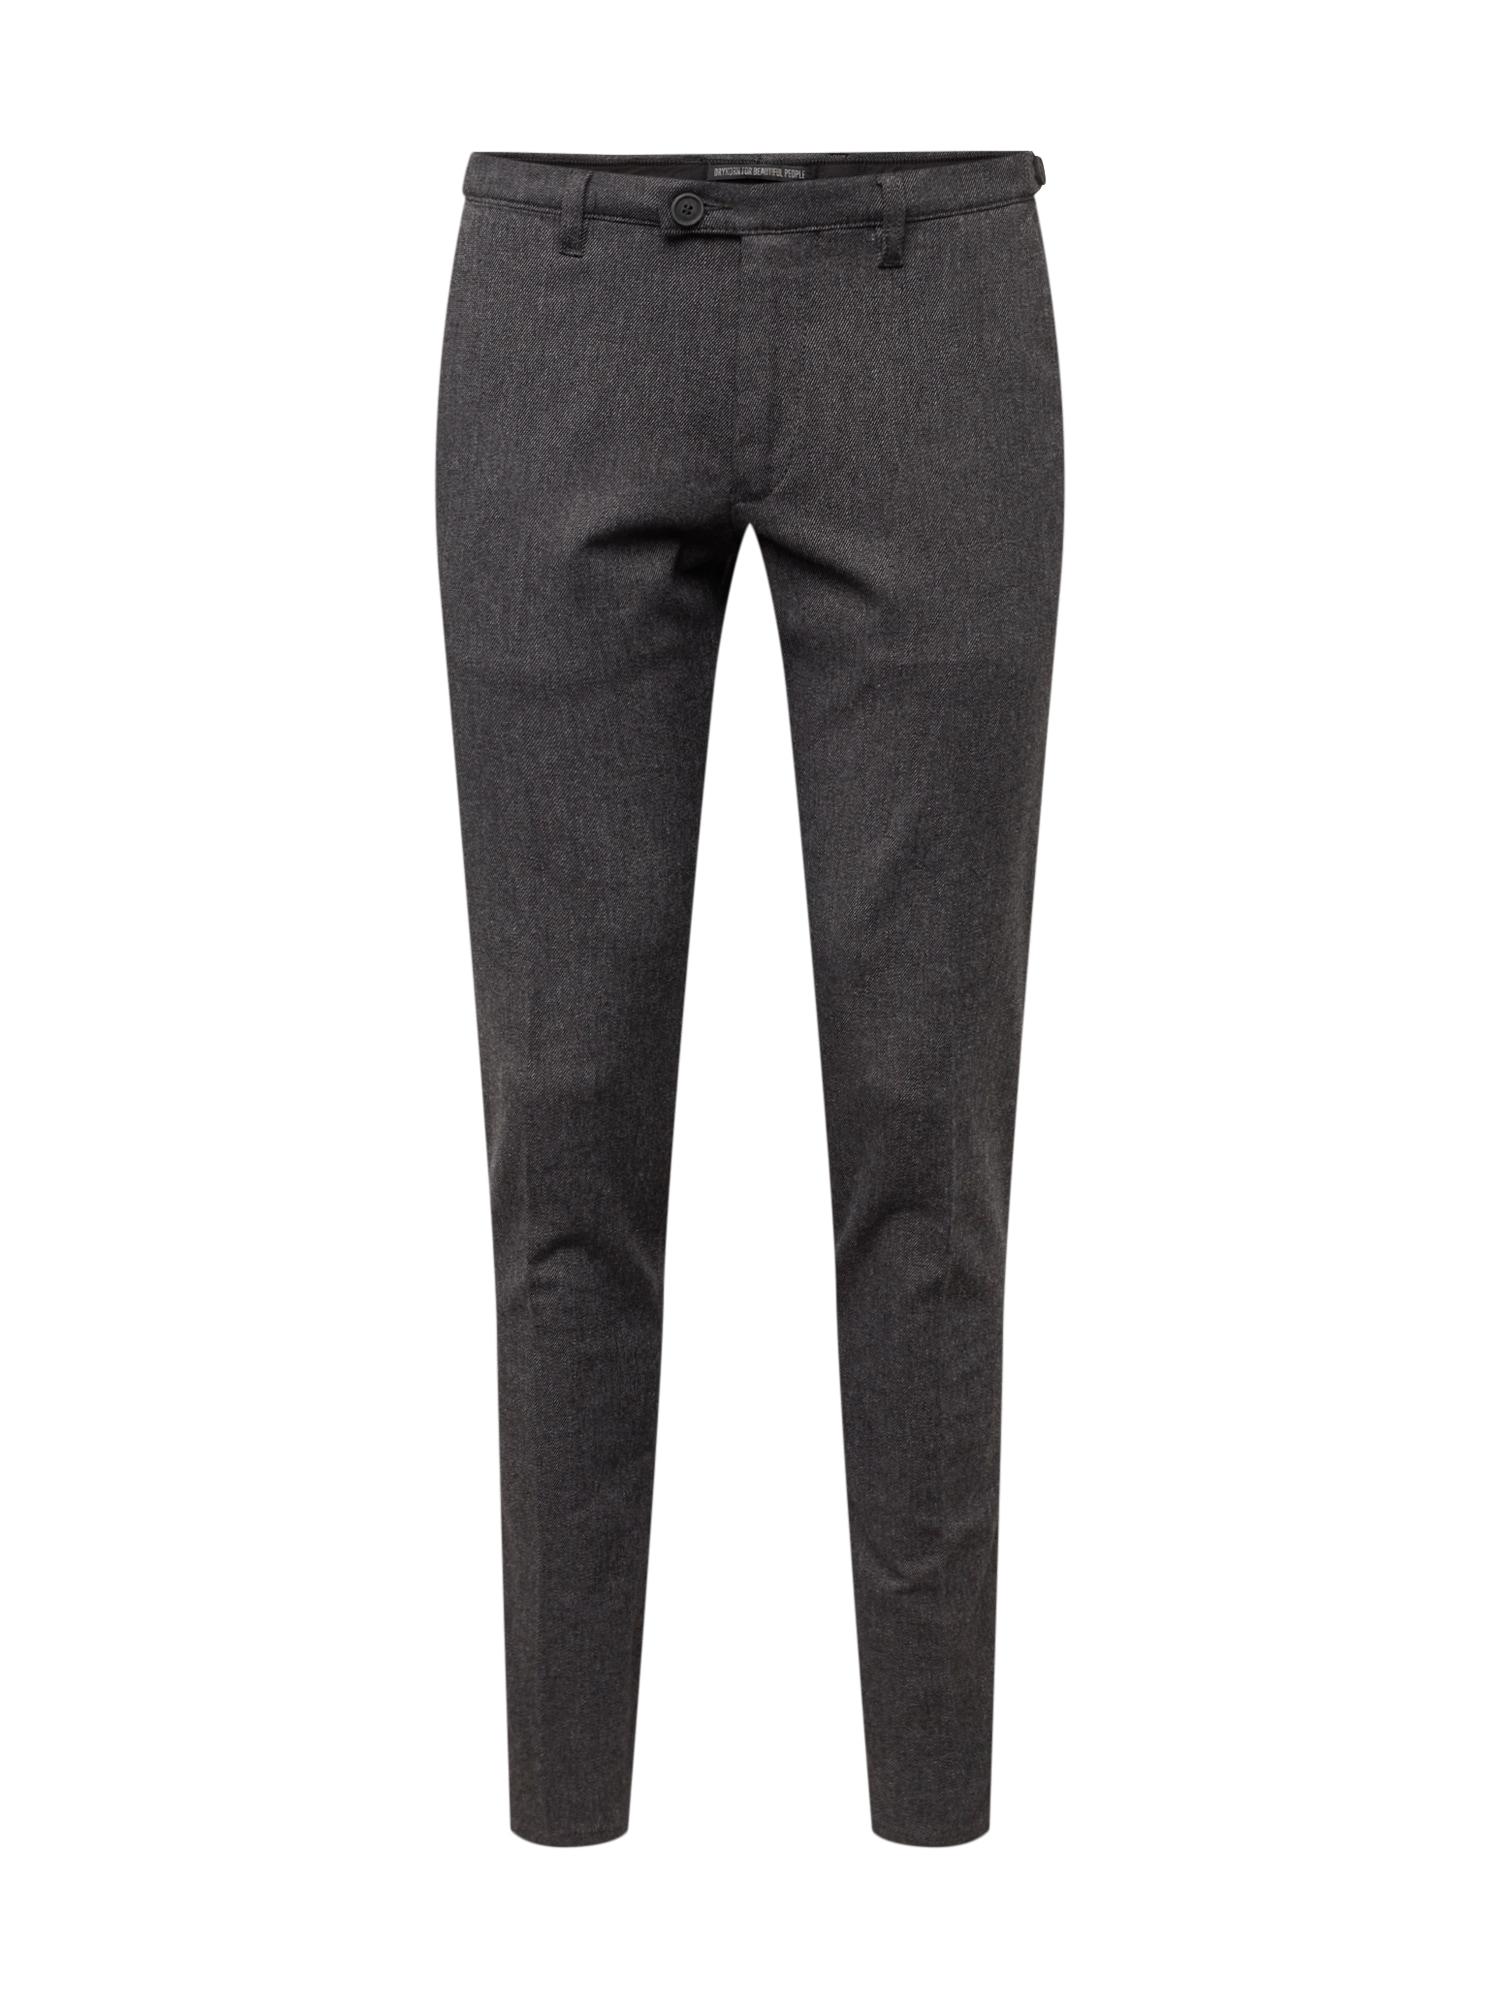 Chino kalhoty KILL tmavě šedá DRYKORN